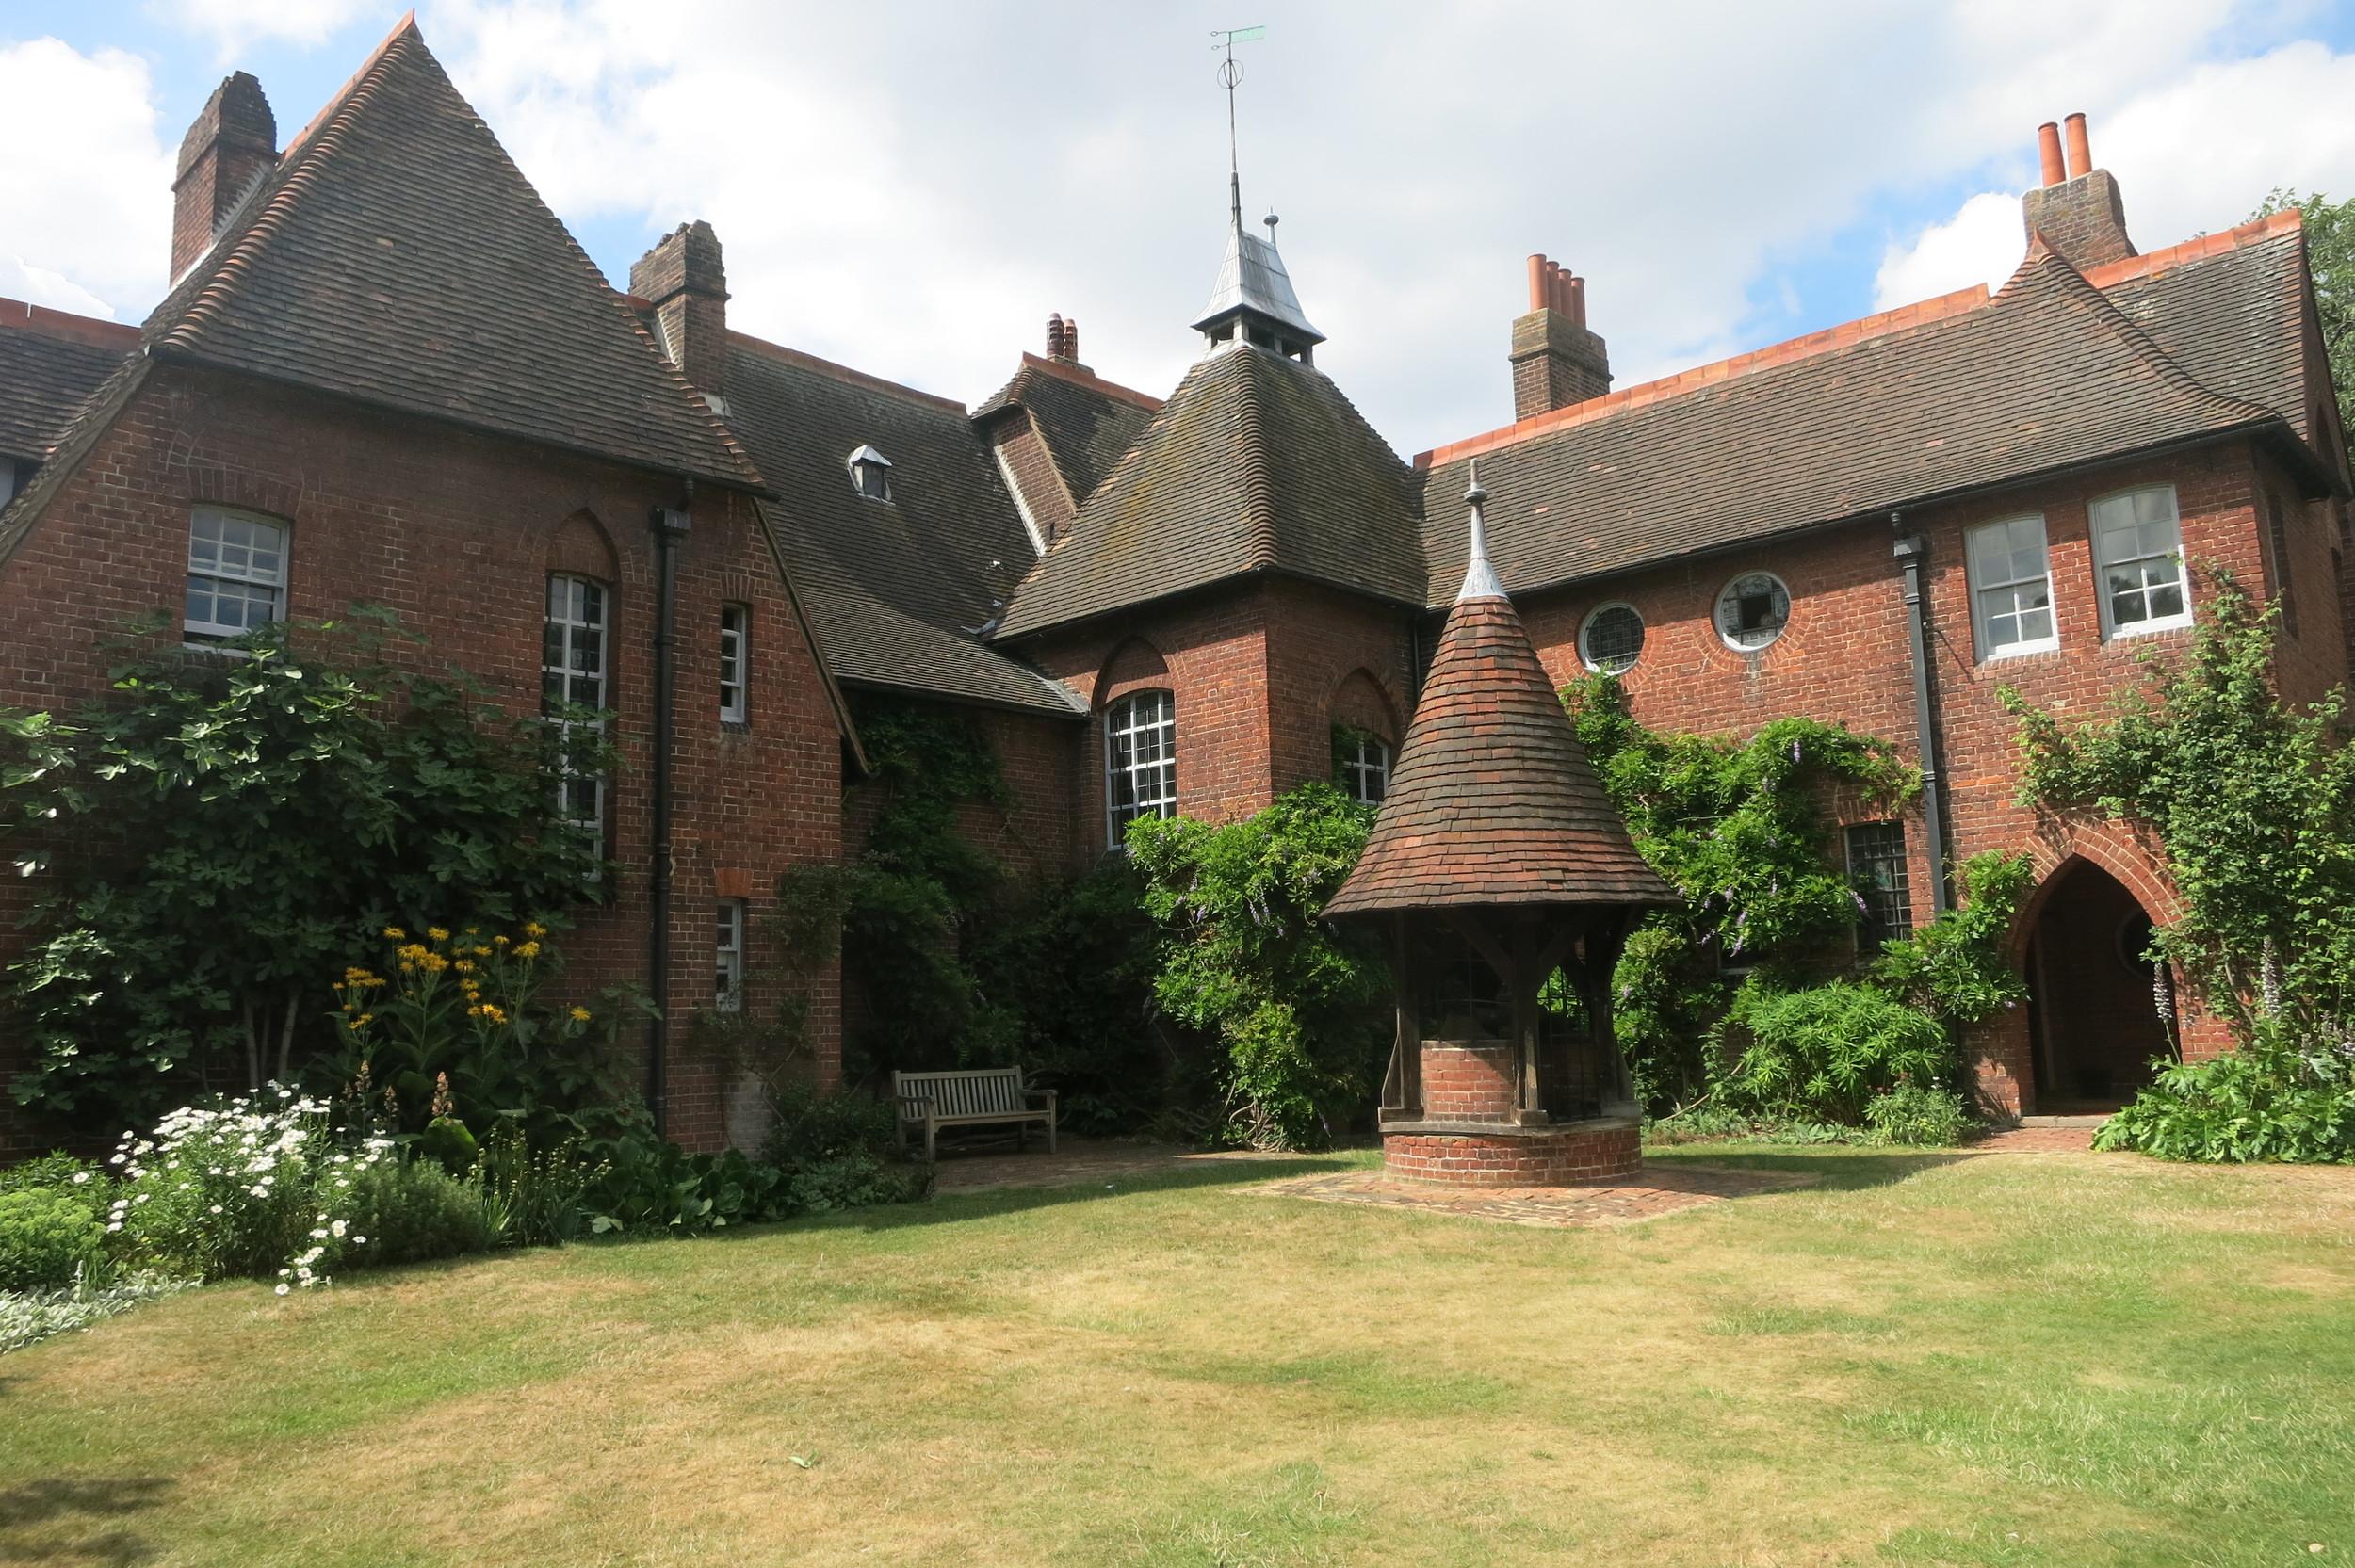 William Morris's 'Red House'